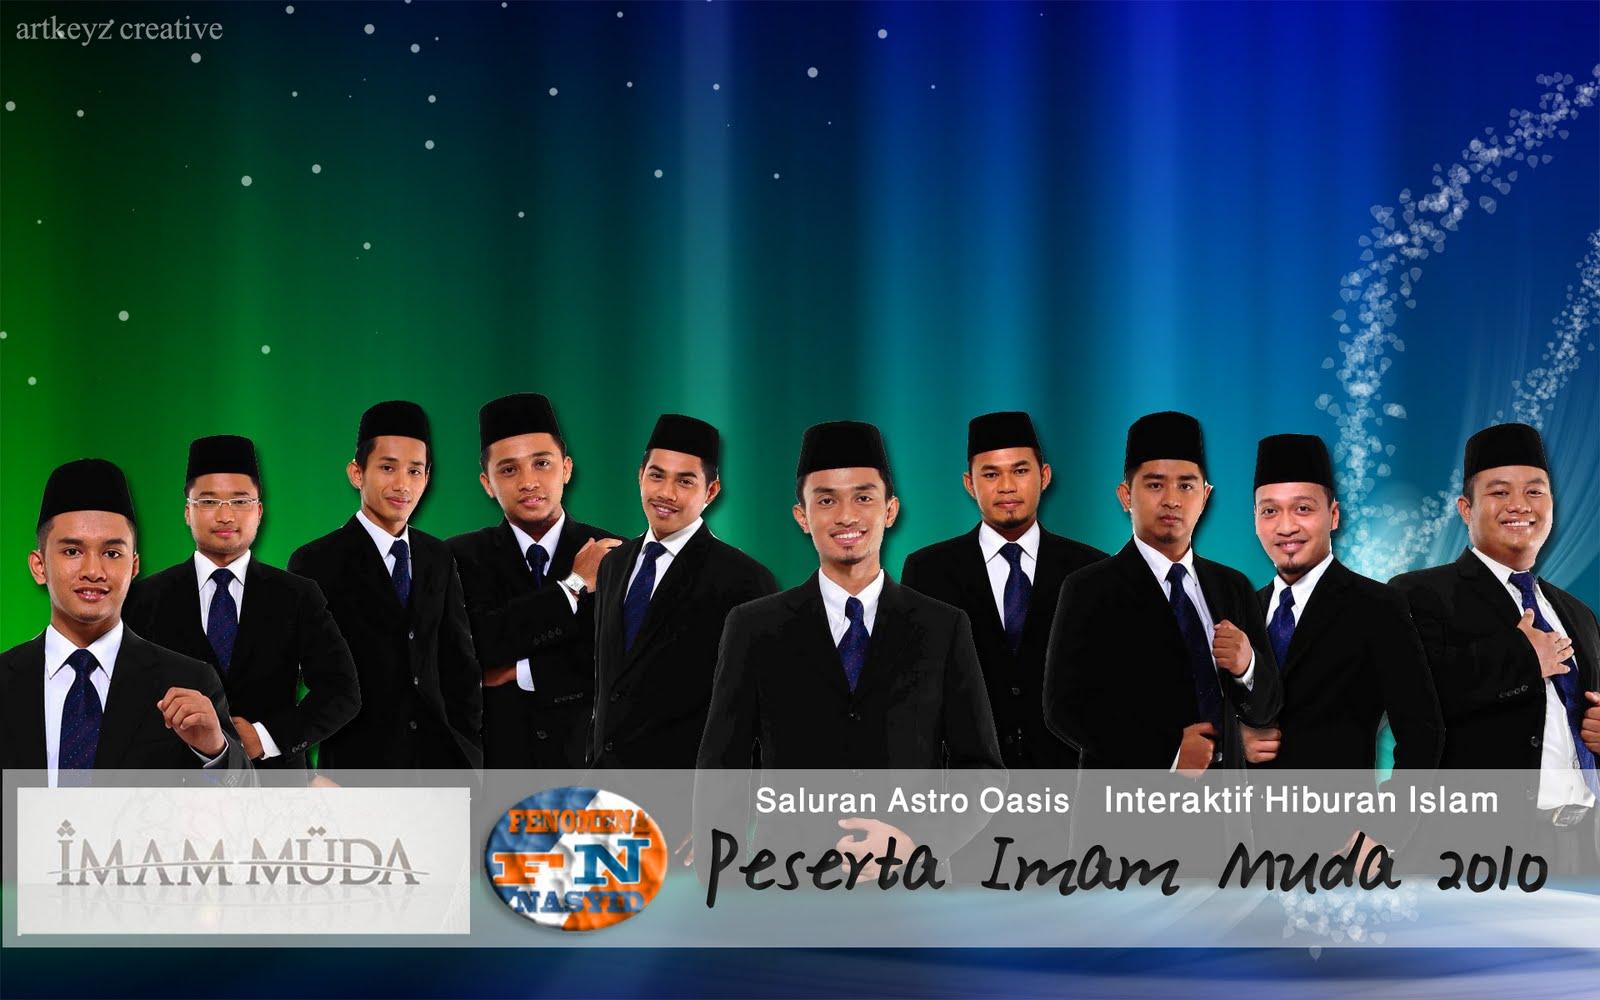 http://1.bp.blogspot.com/_l5OLBXKsZlk/S_dcNSKKa7I/AAAAAAAACDs/-m--U5HRYnU/s1600/imam+muda.jpg